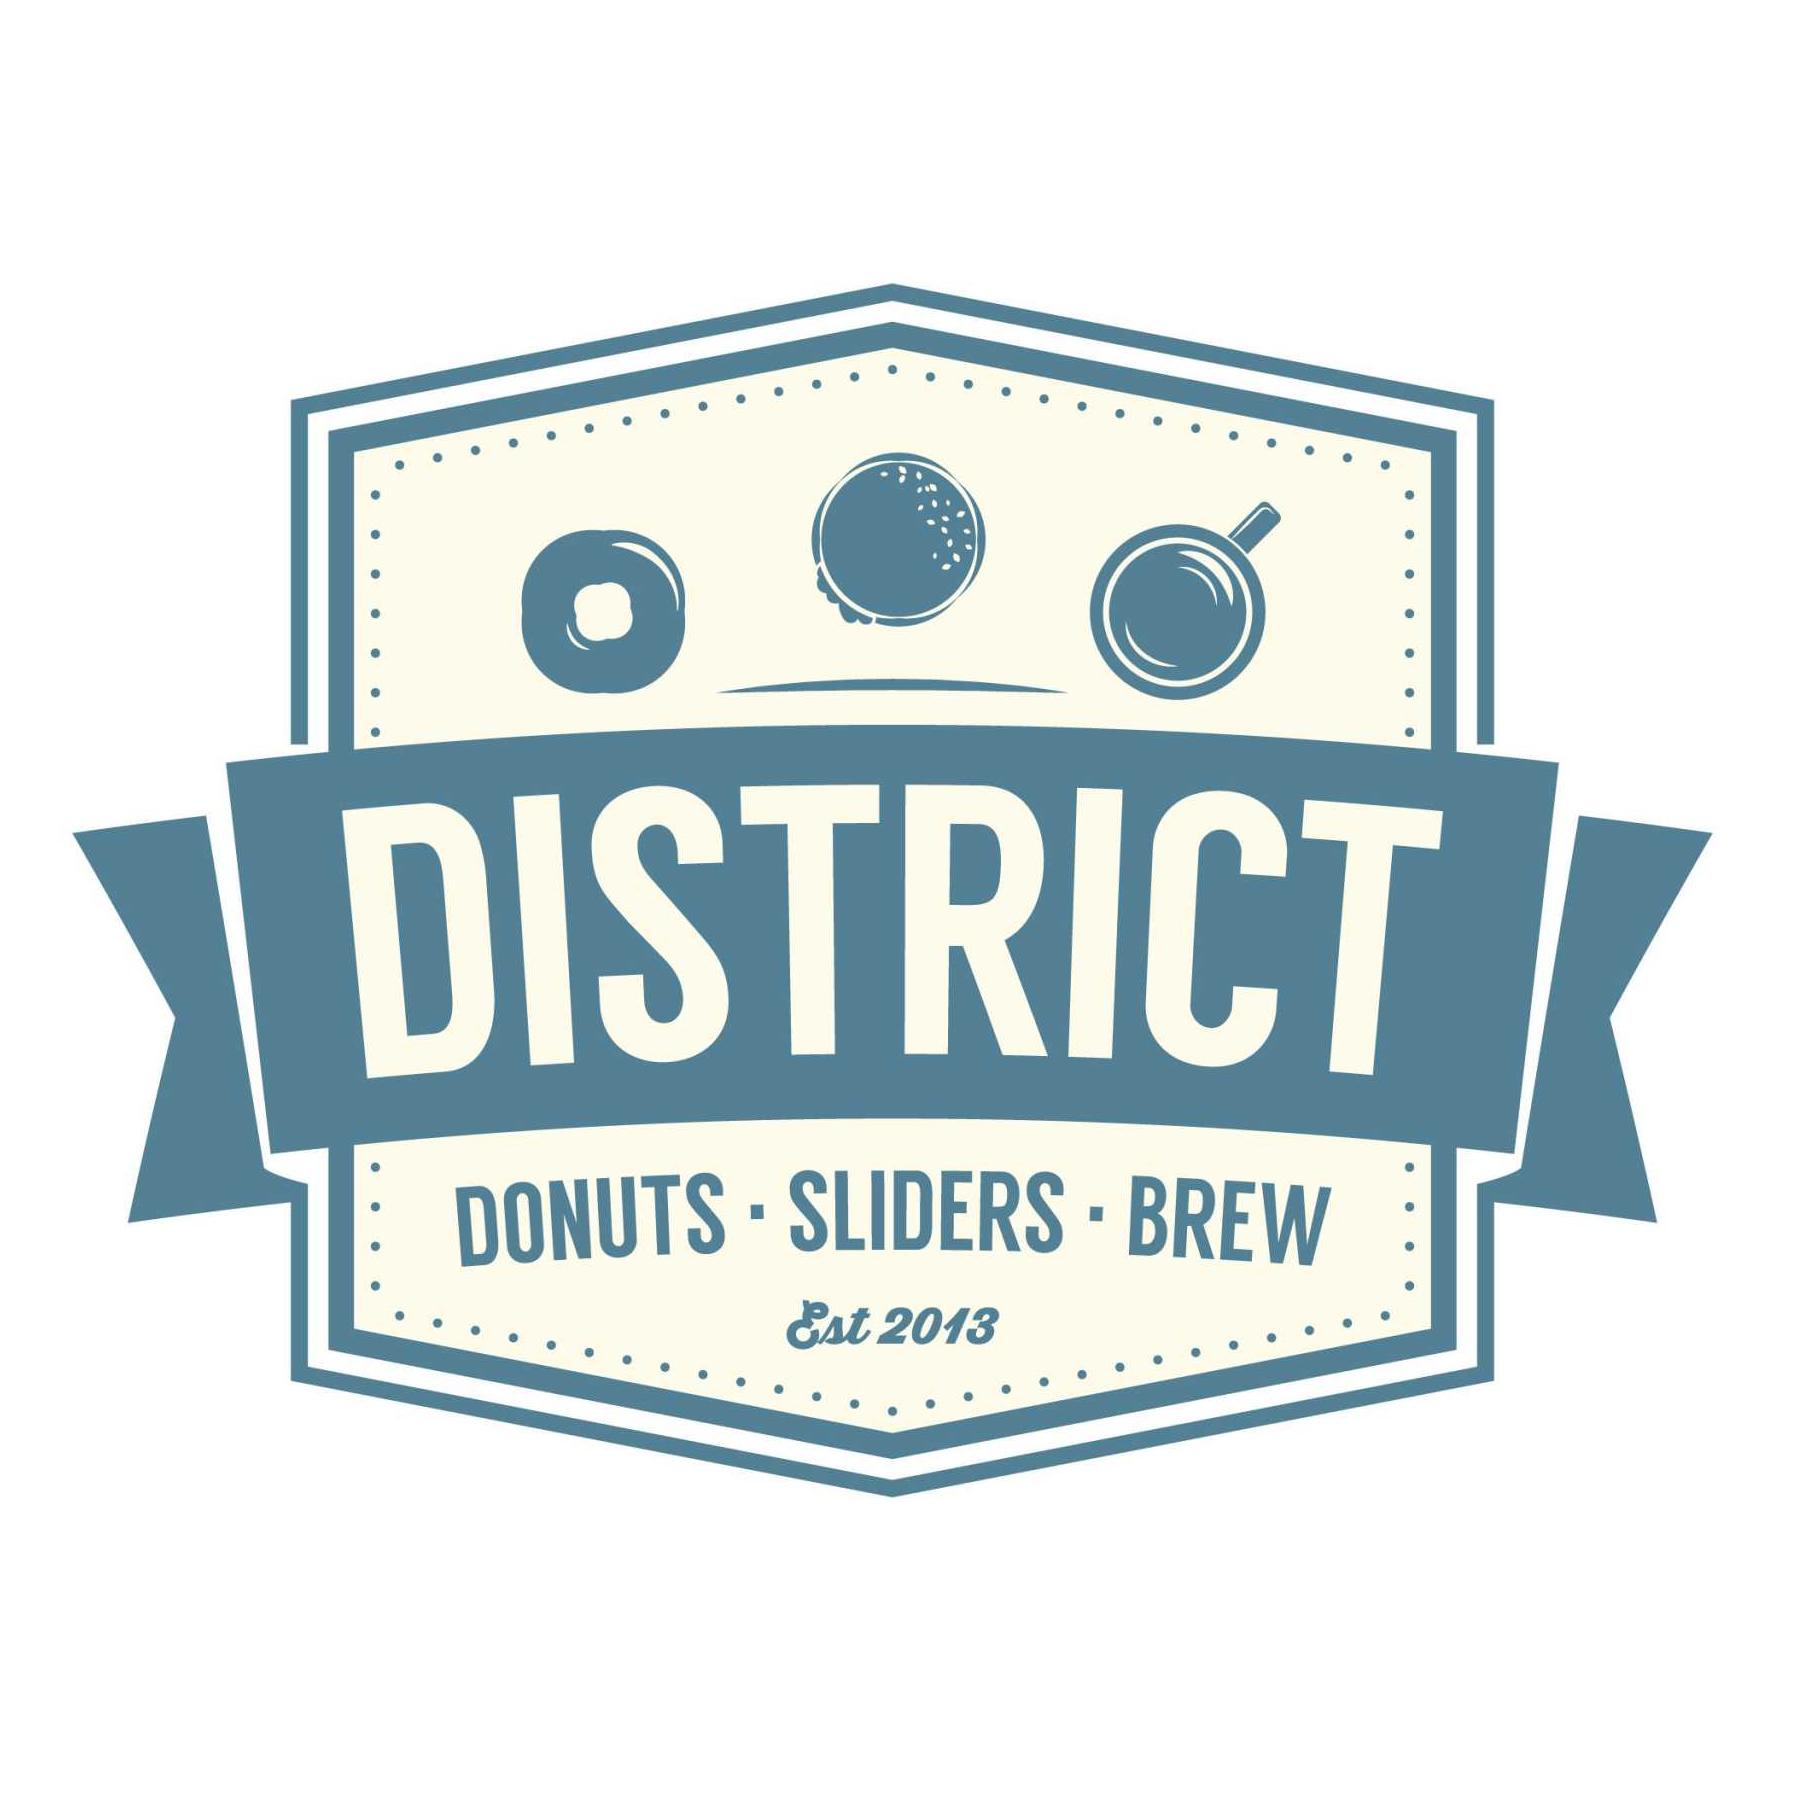 District: Donuts. Sliders. Brew.